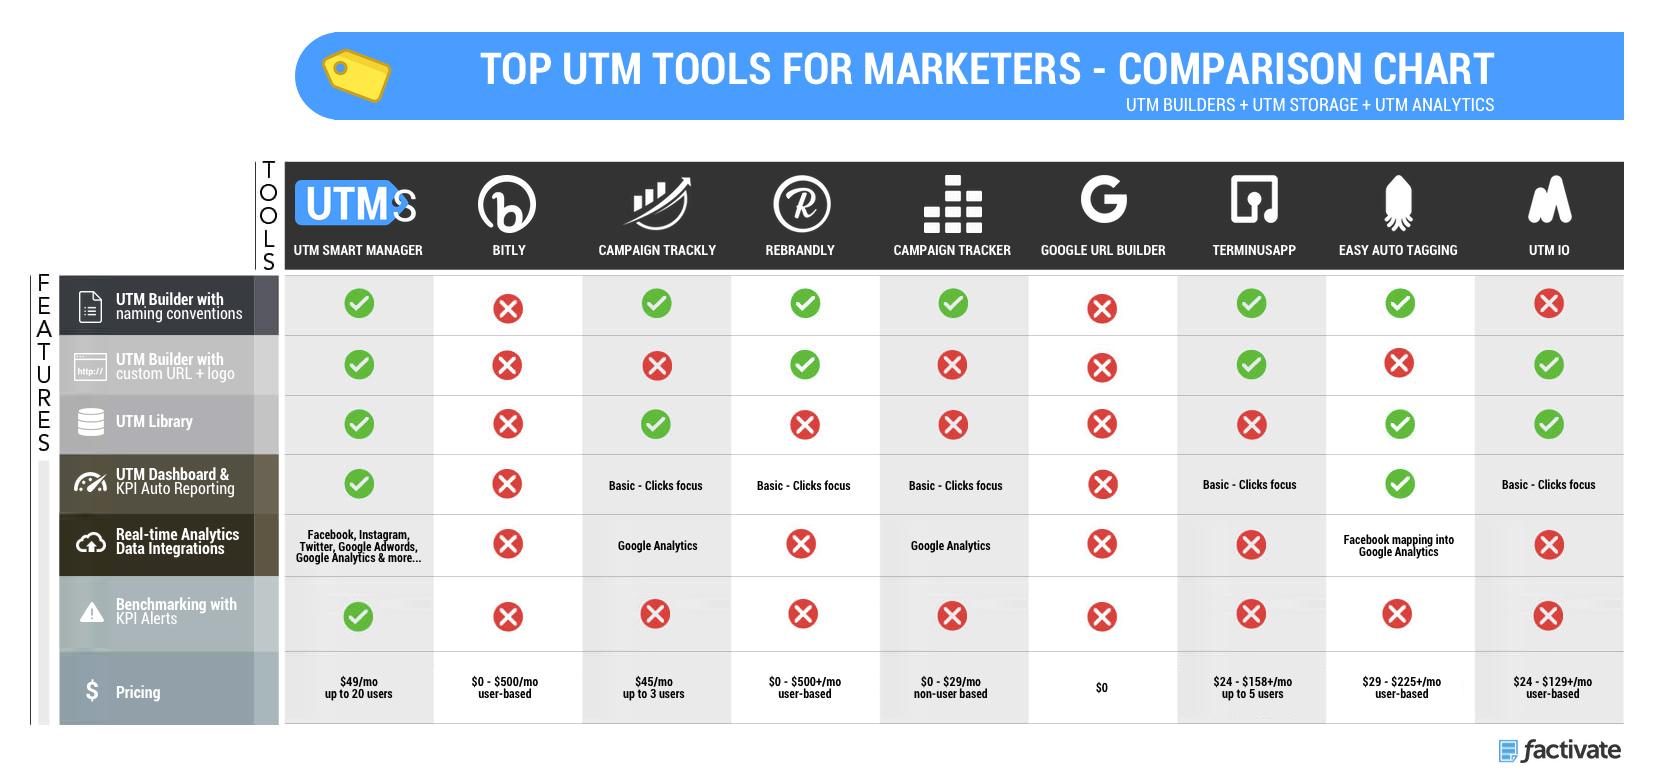 best utm builders for marketers comparison chart